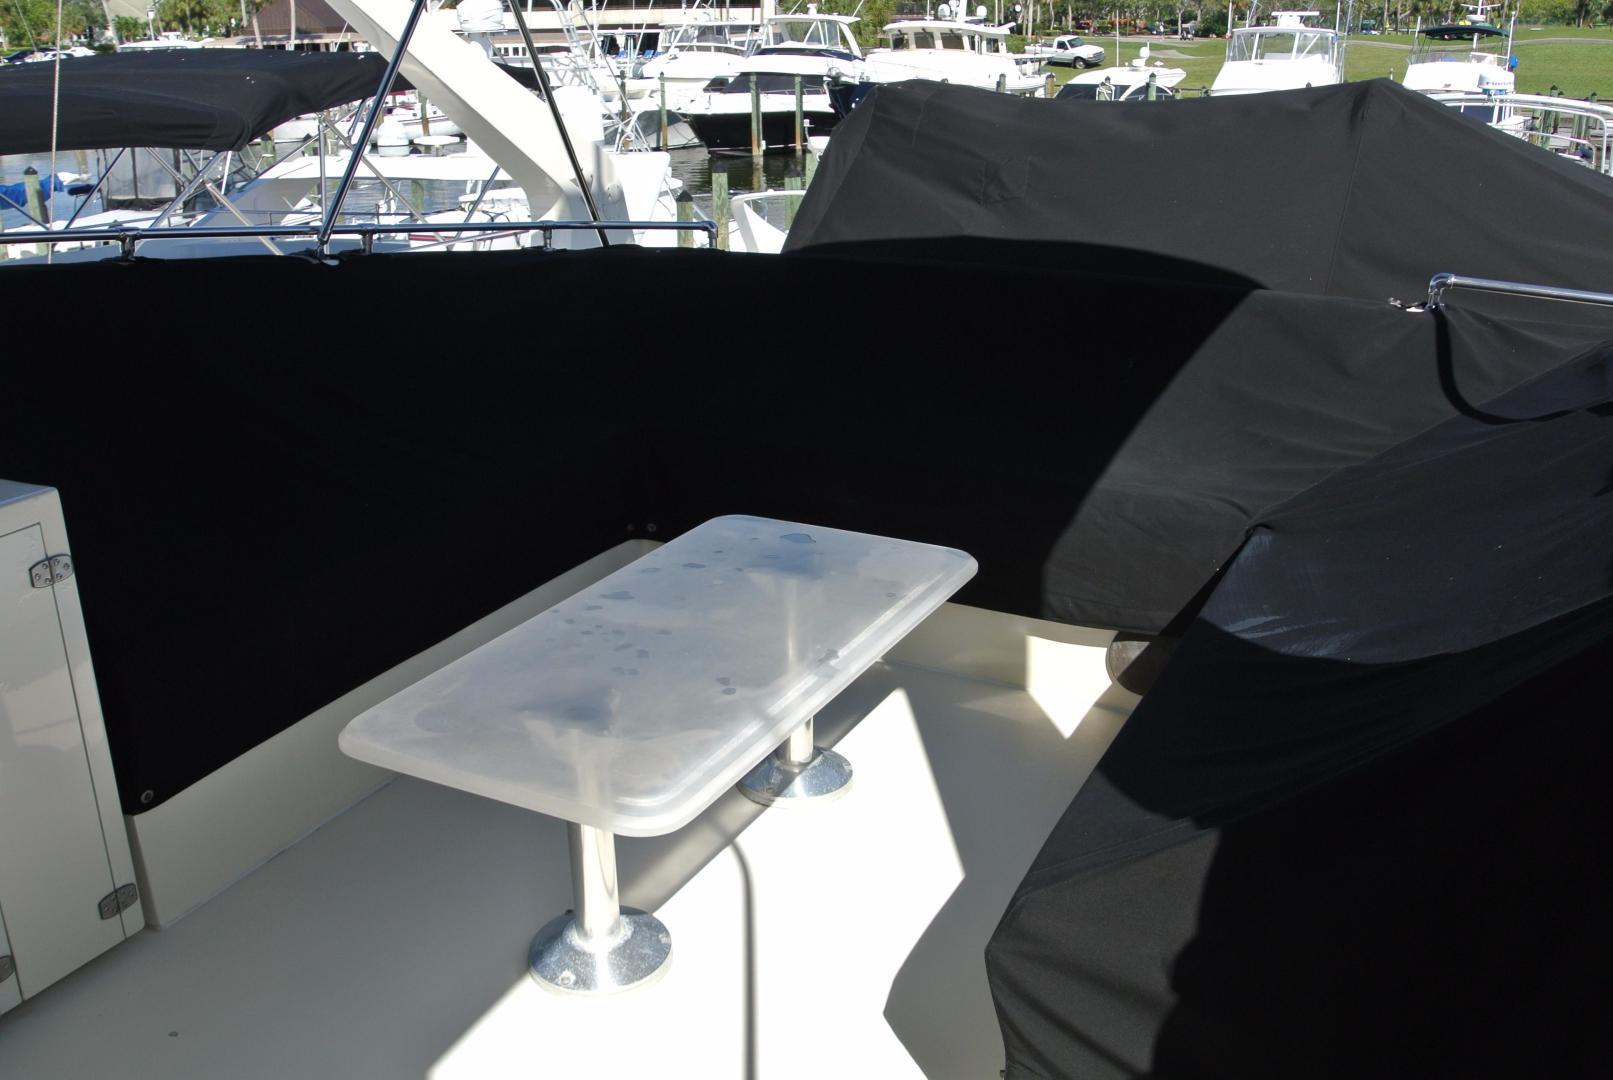 Hatteras-67-Cockpit-Motor-Yacht-1988-Lady-Encore-Saint-Petersburg-Florida-United-States-Fly-Bridge-seating-926185